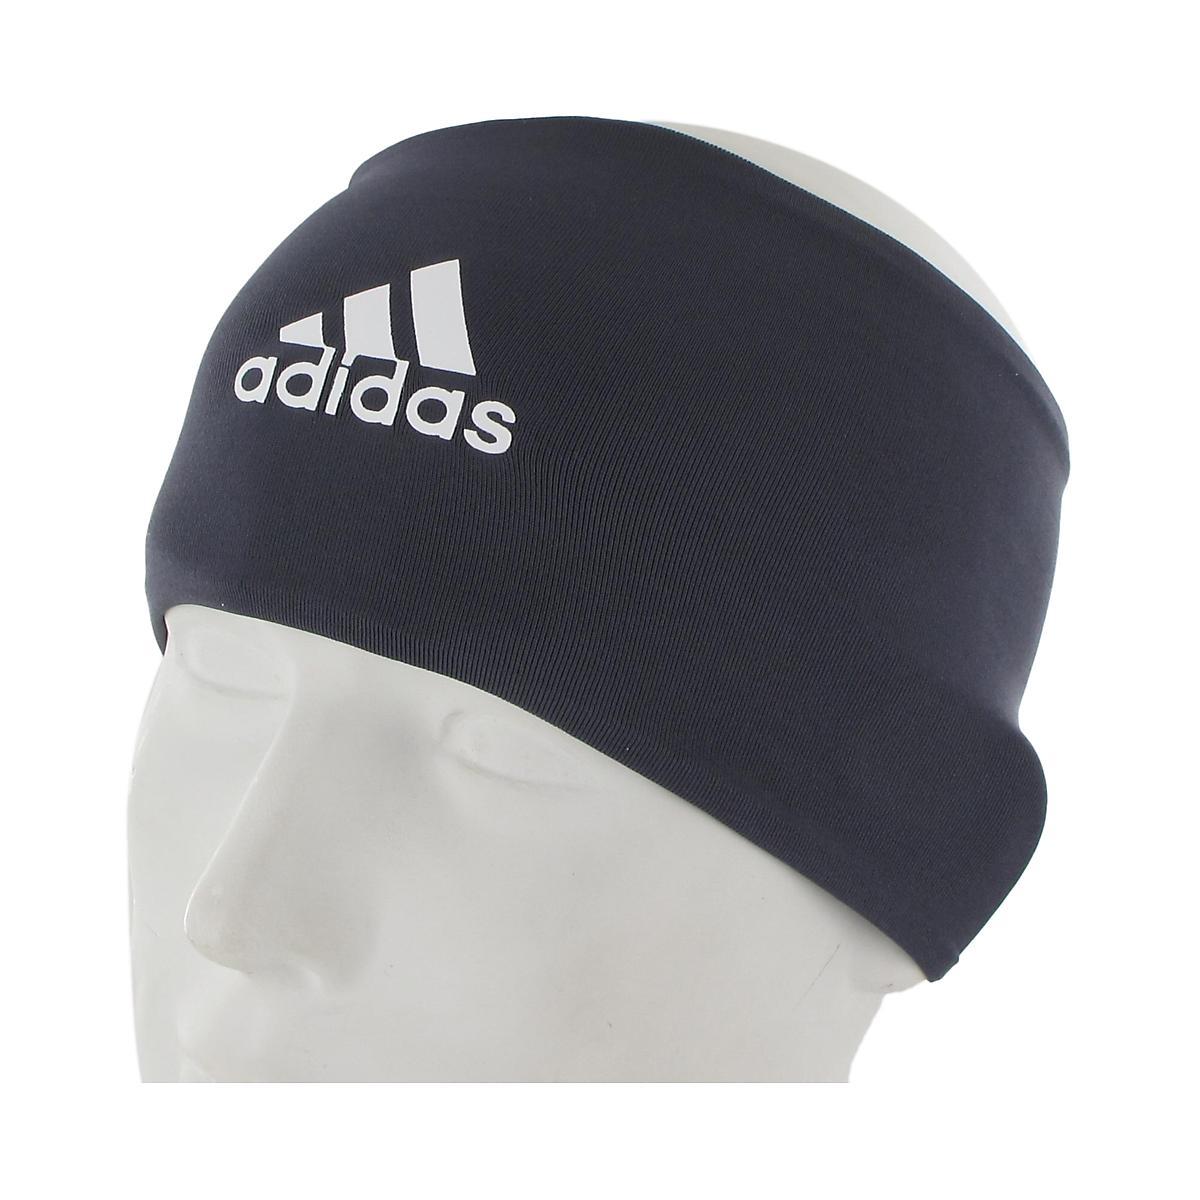 adidas Football Skull Wrap Headwear at Road Runner Sports 614a33d417a